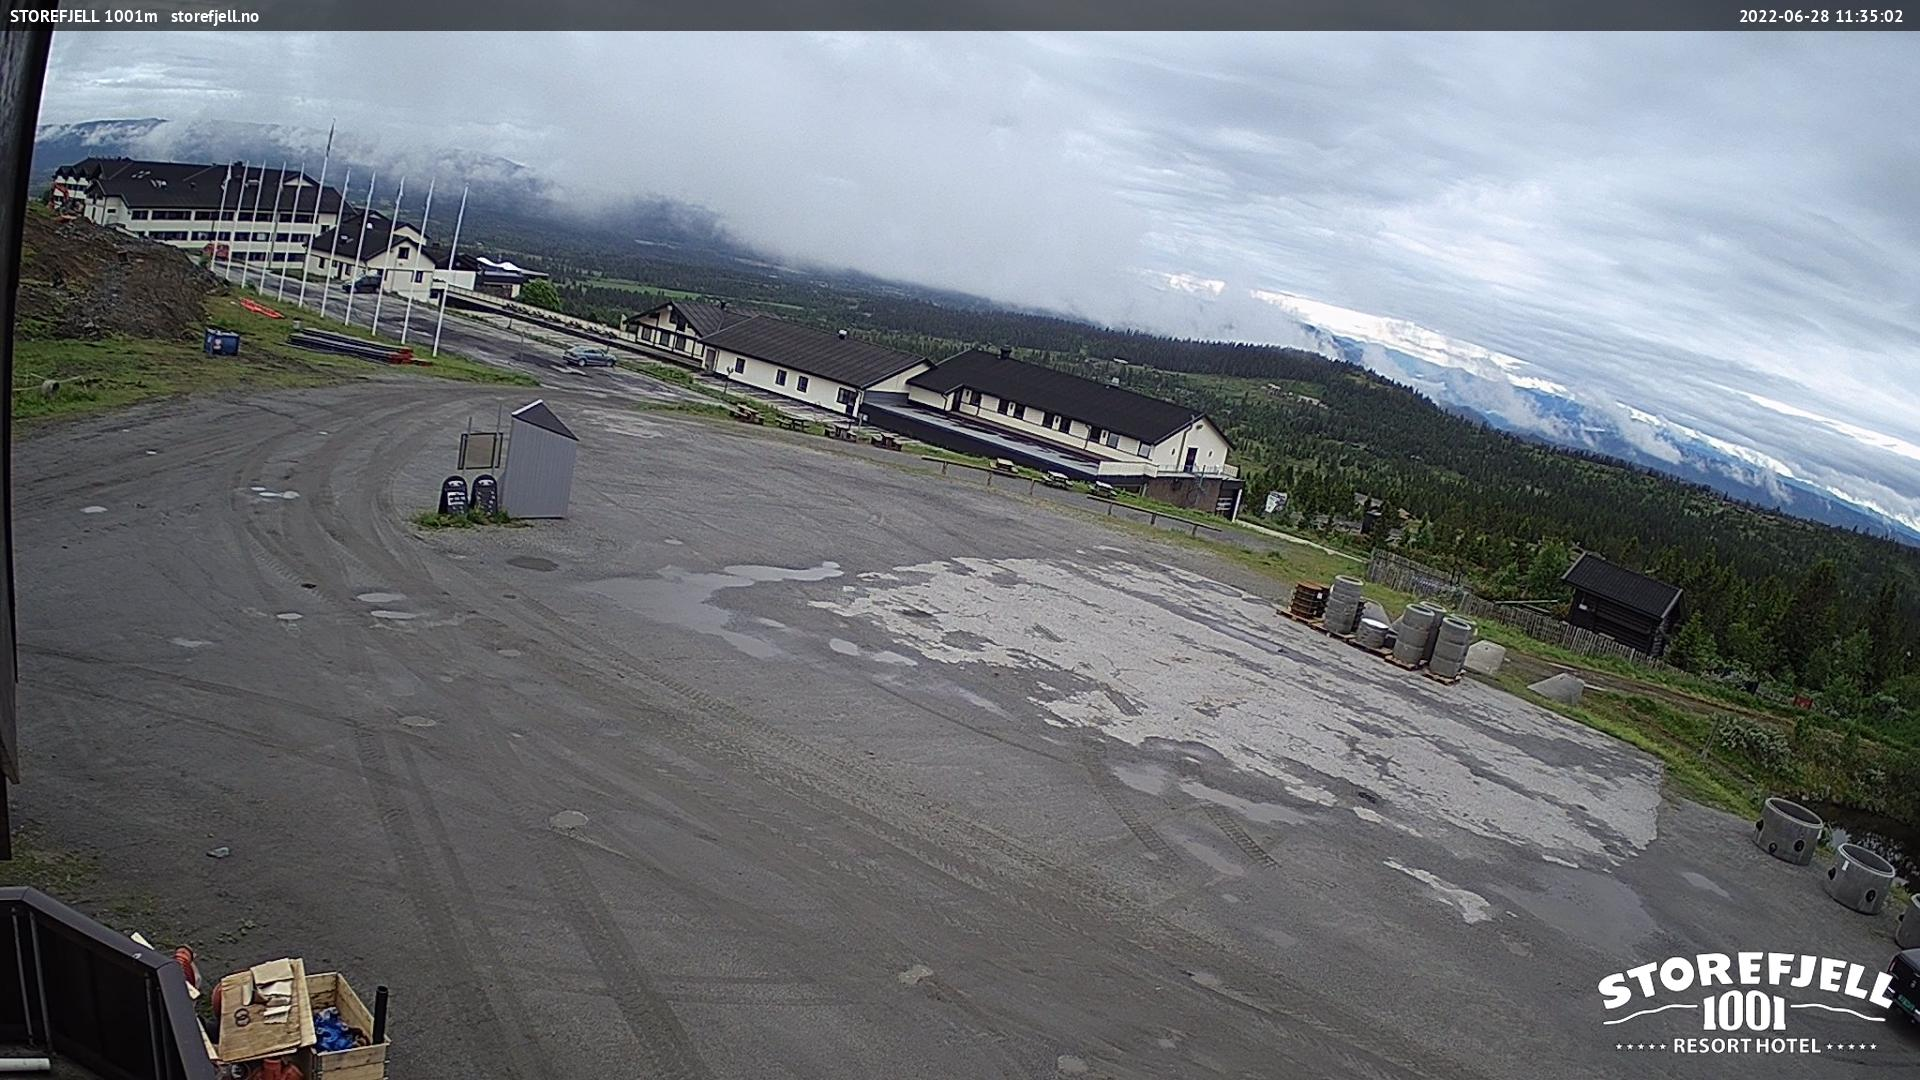 WebCam Storefjell, Golsfjellet, Hallingdal, Norge